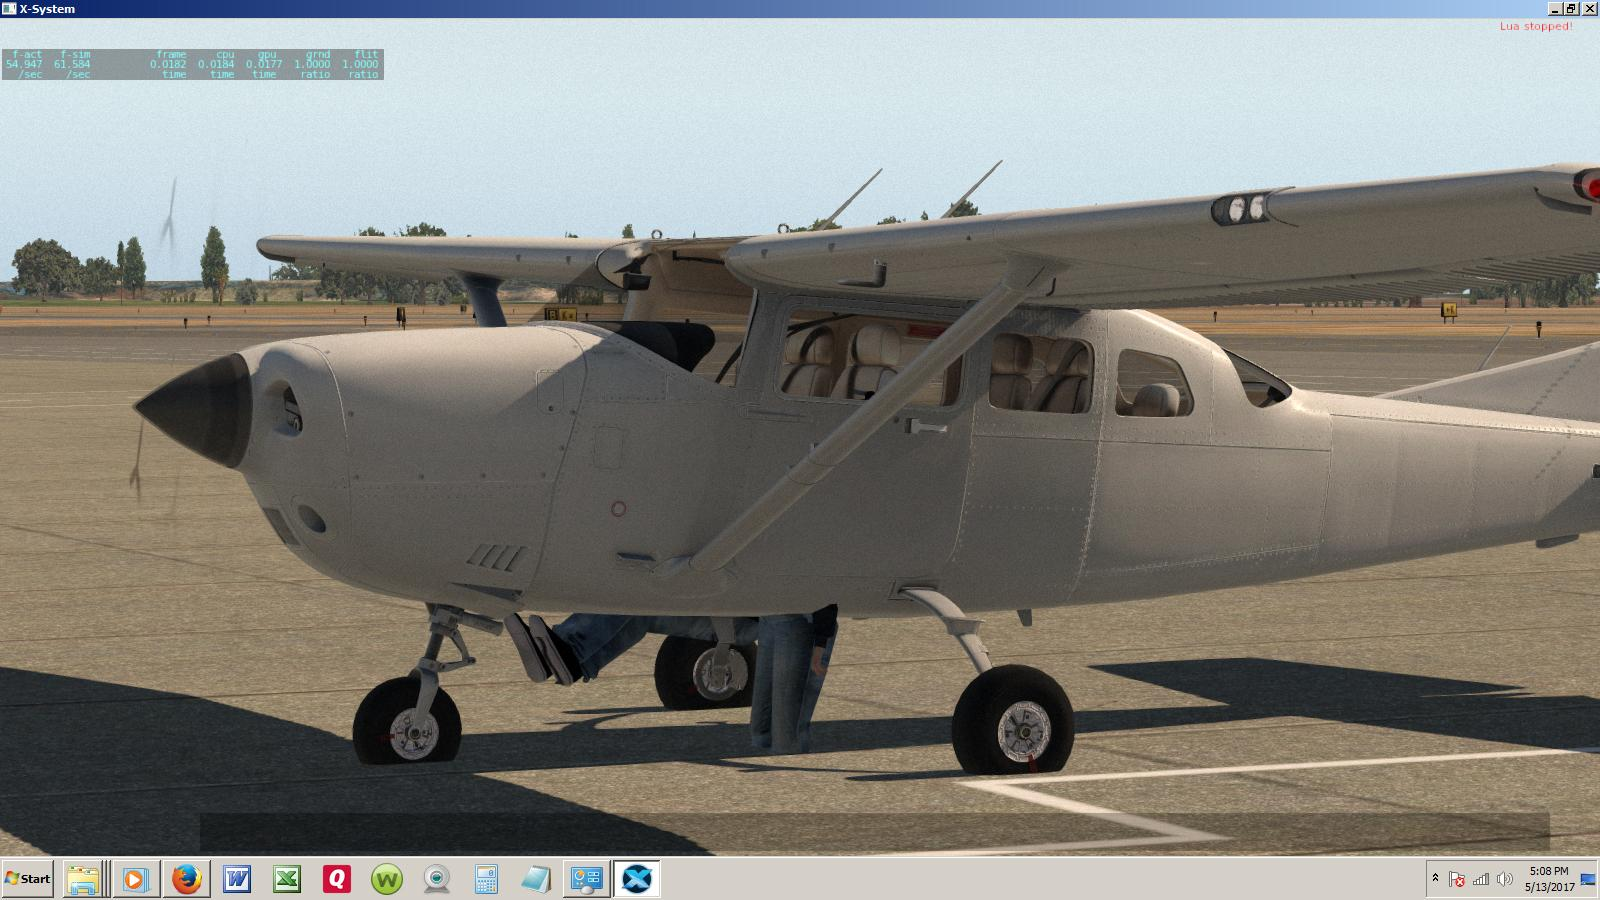 More X-Plane 11 humor - XP11 General discussion - X-Plane Org Forum